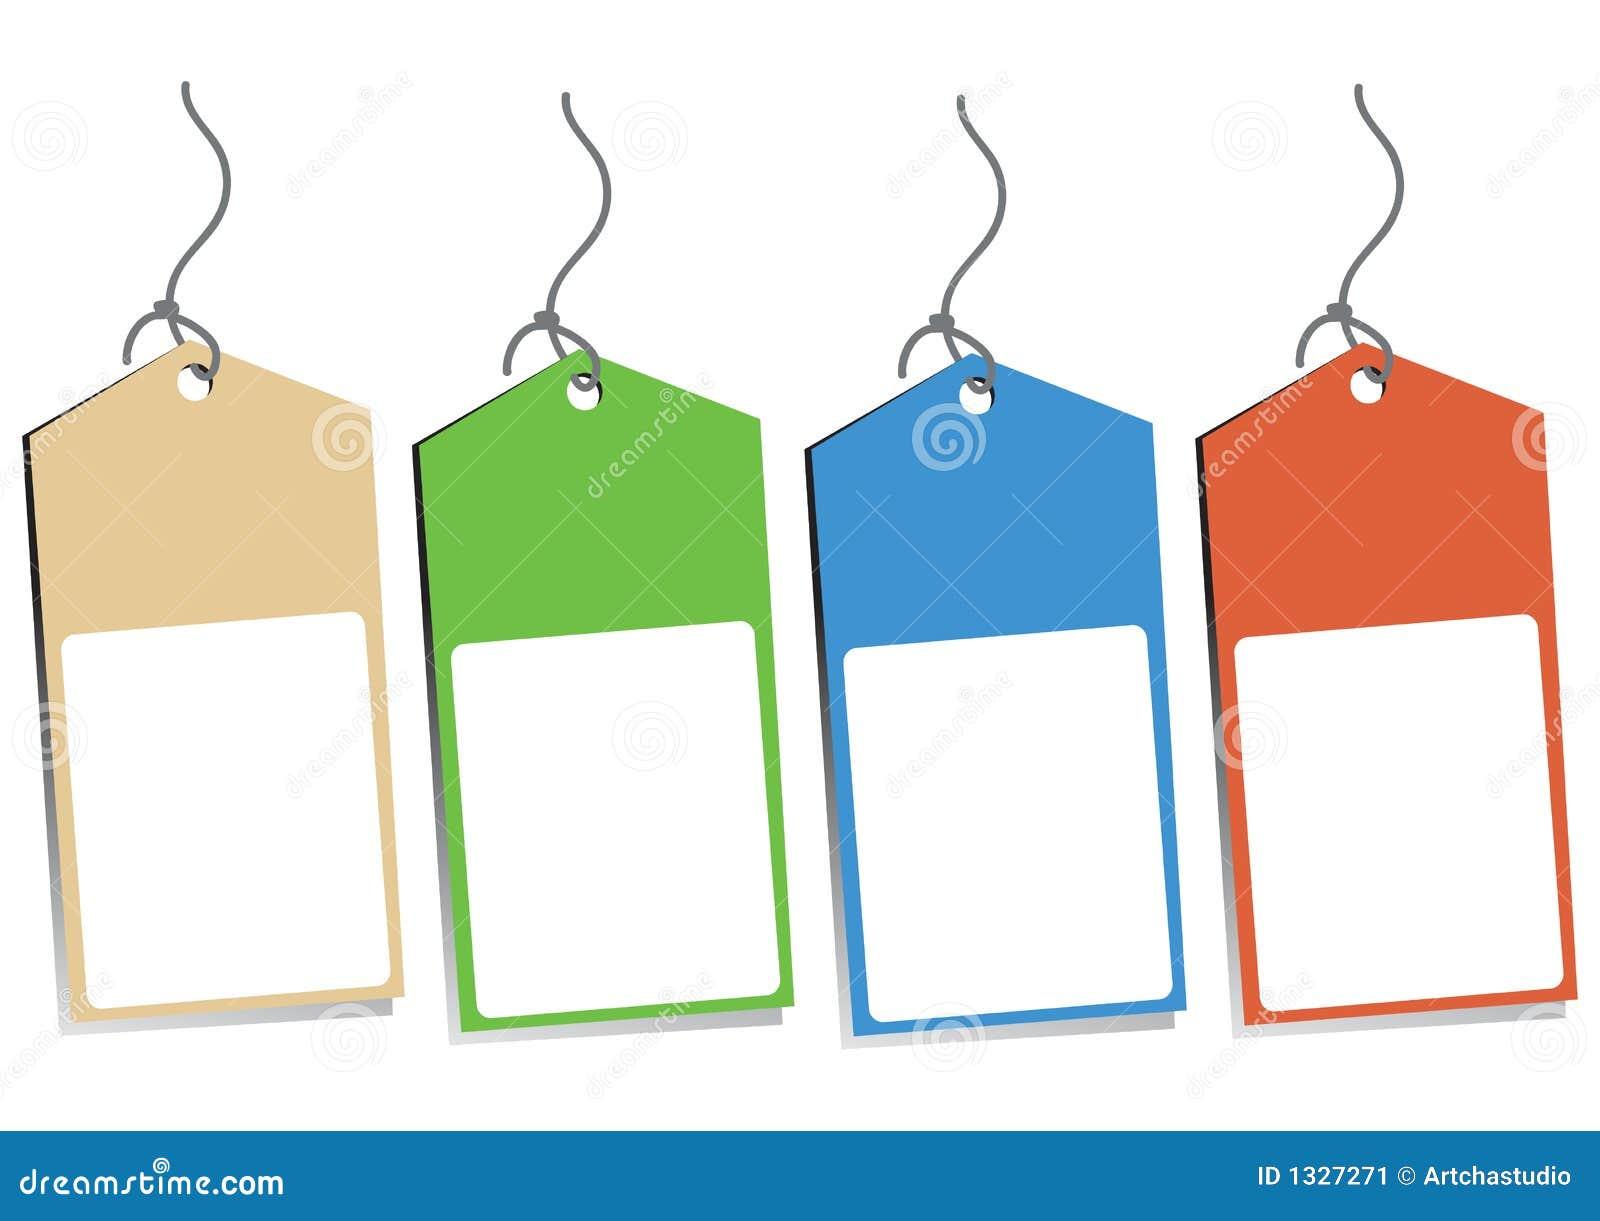 Four Blank Hang Tags Stock Image - Image: 1327271